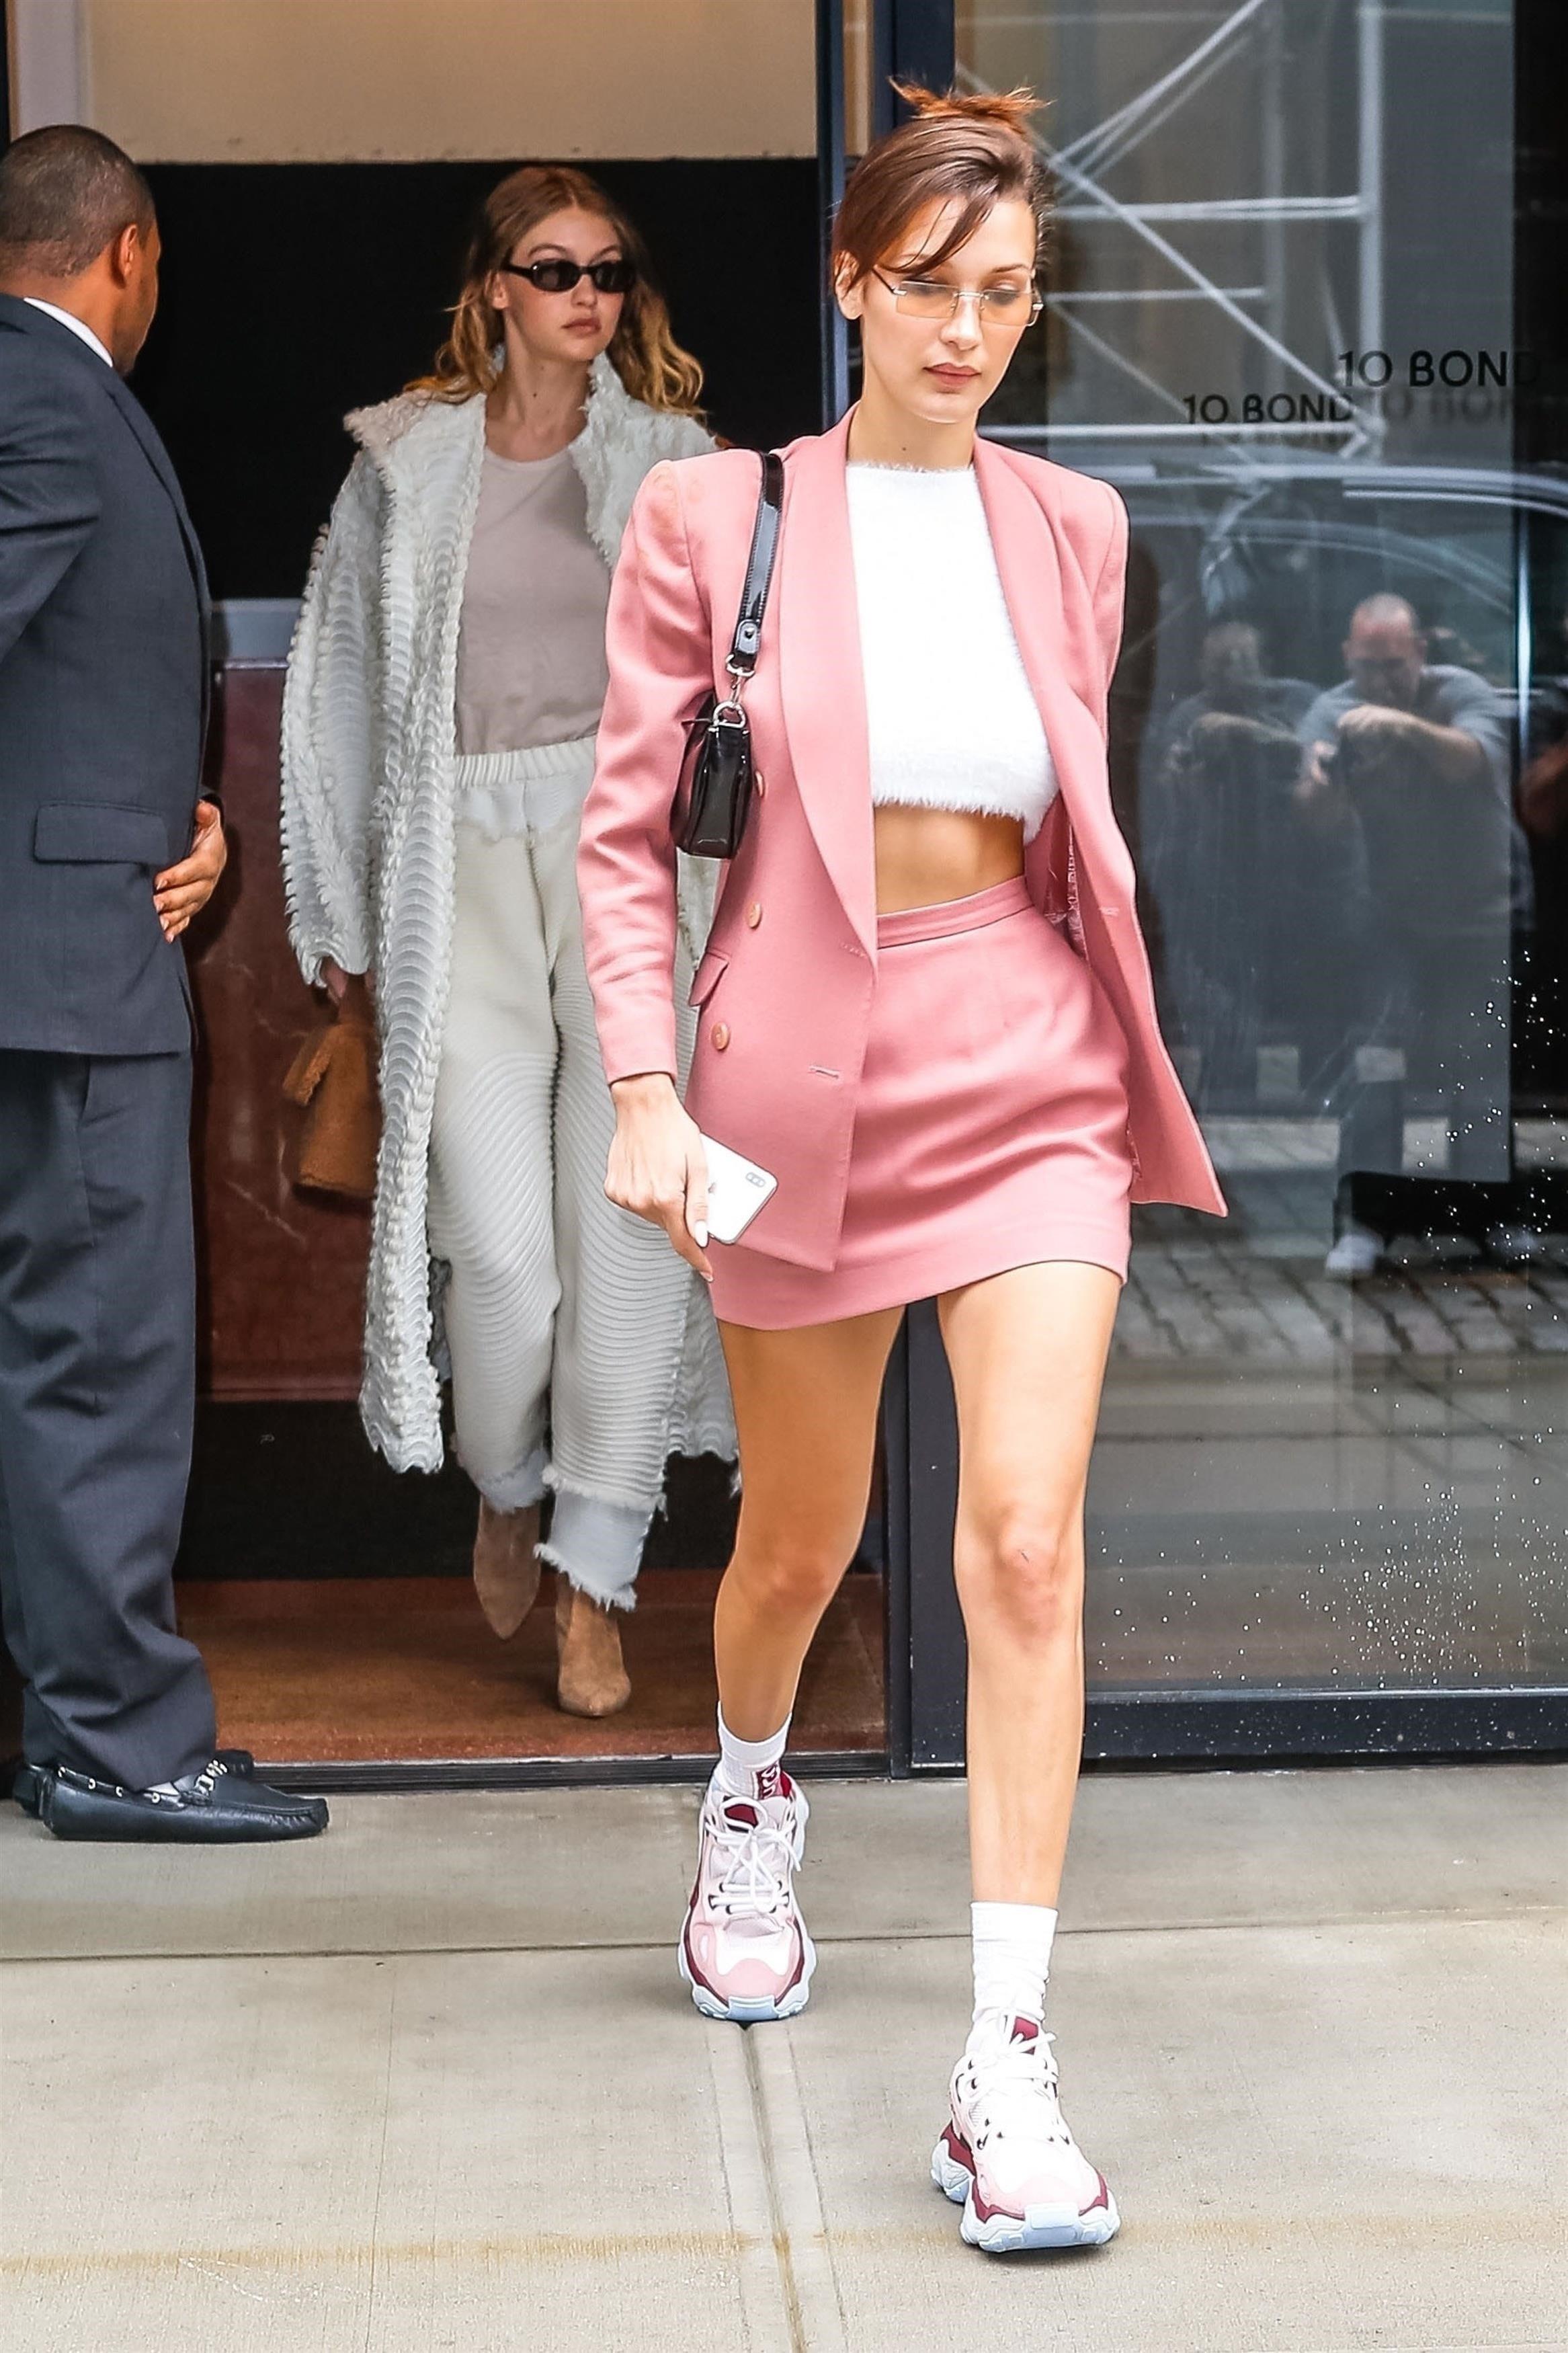 Bella Hadid arrasou no conjuntinho pink millennial. (Backgrid/Backgrid)